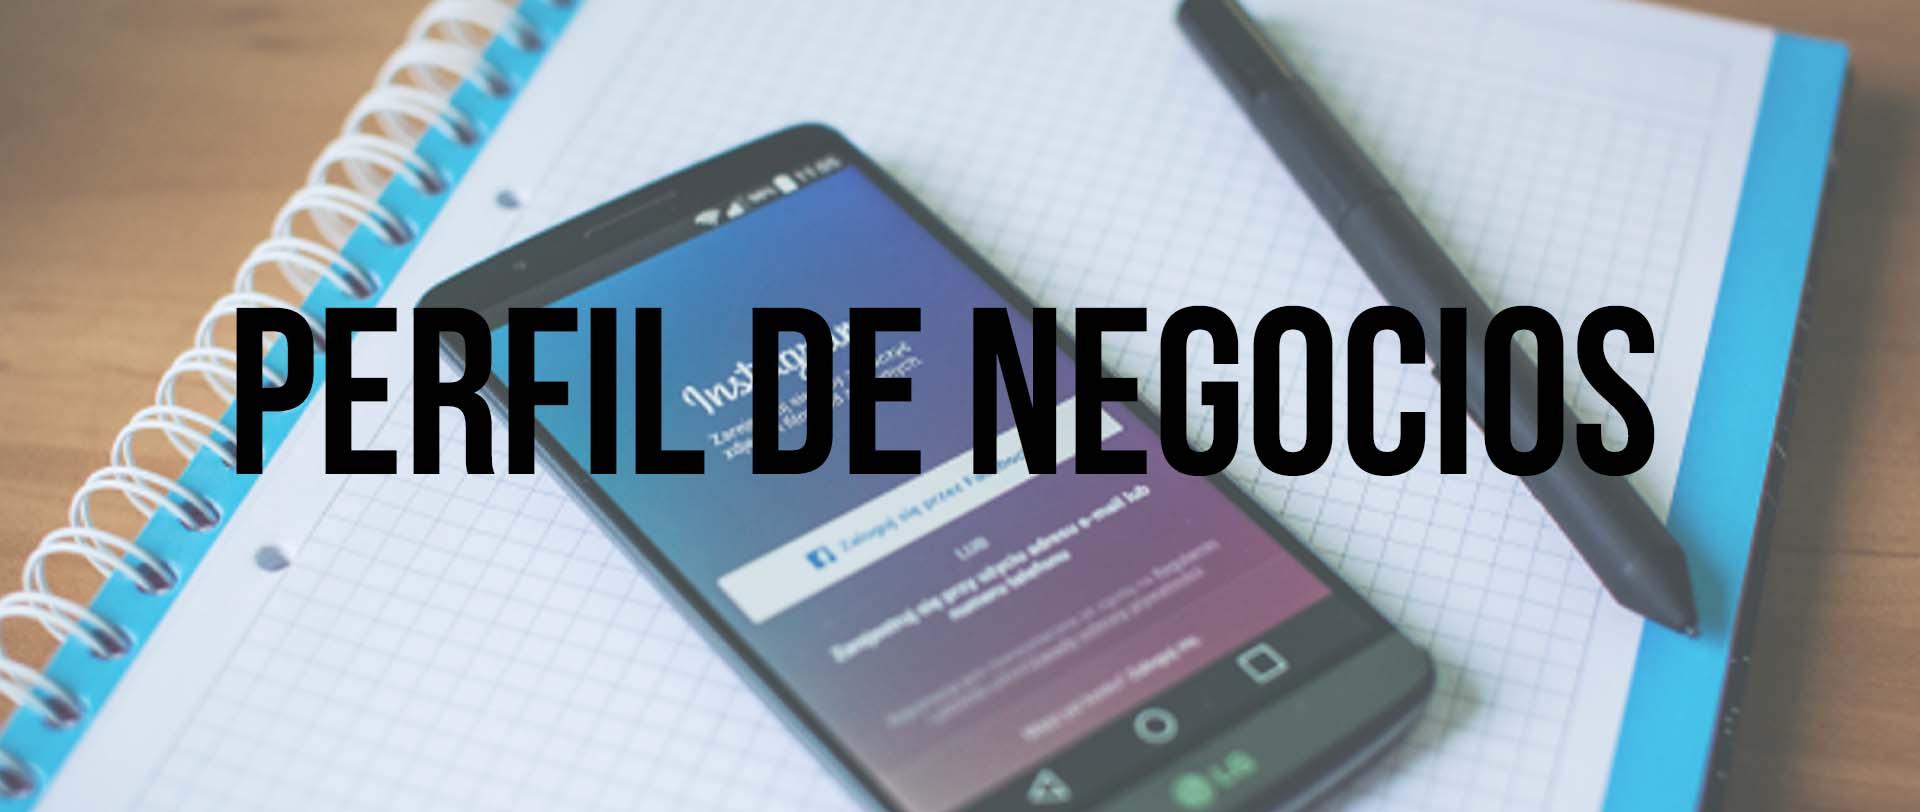 business-profile-instagram-perfil-de-negocios